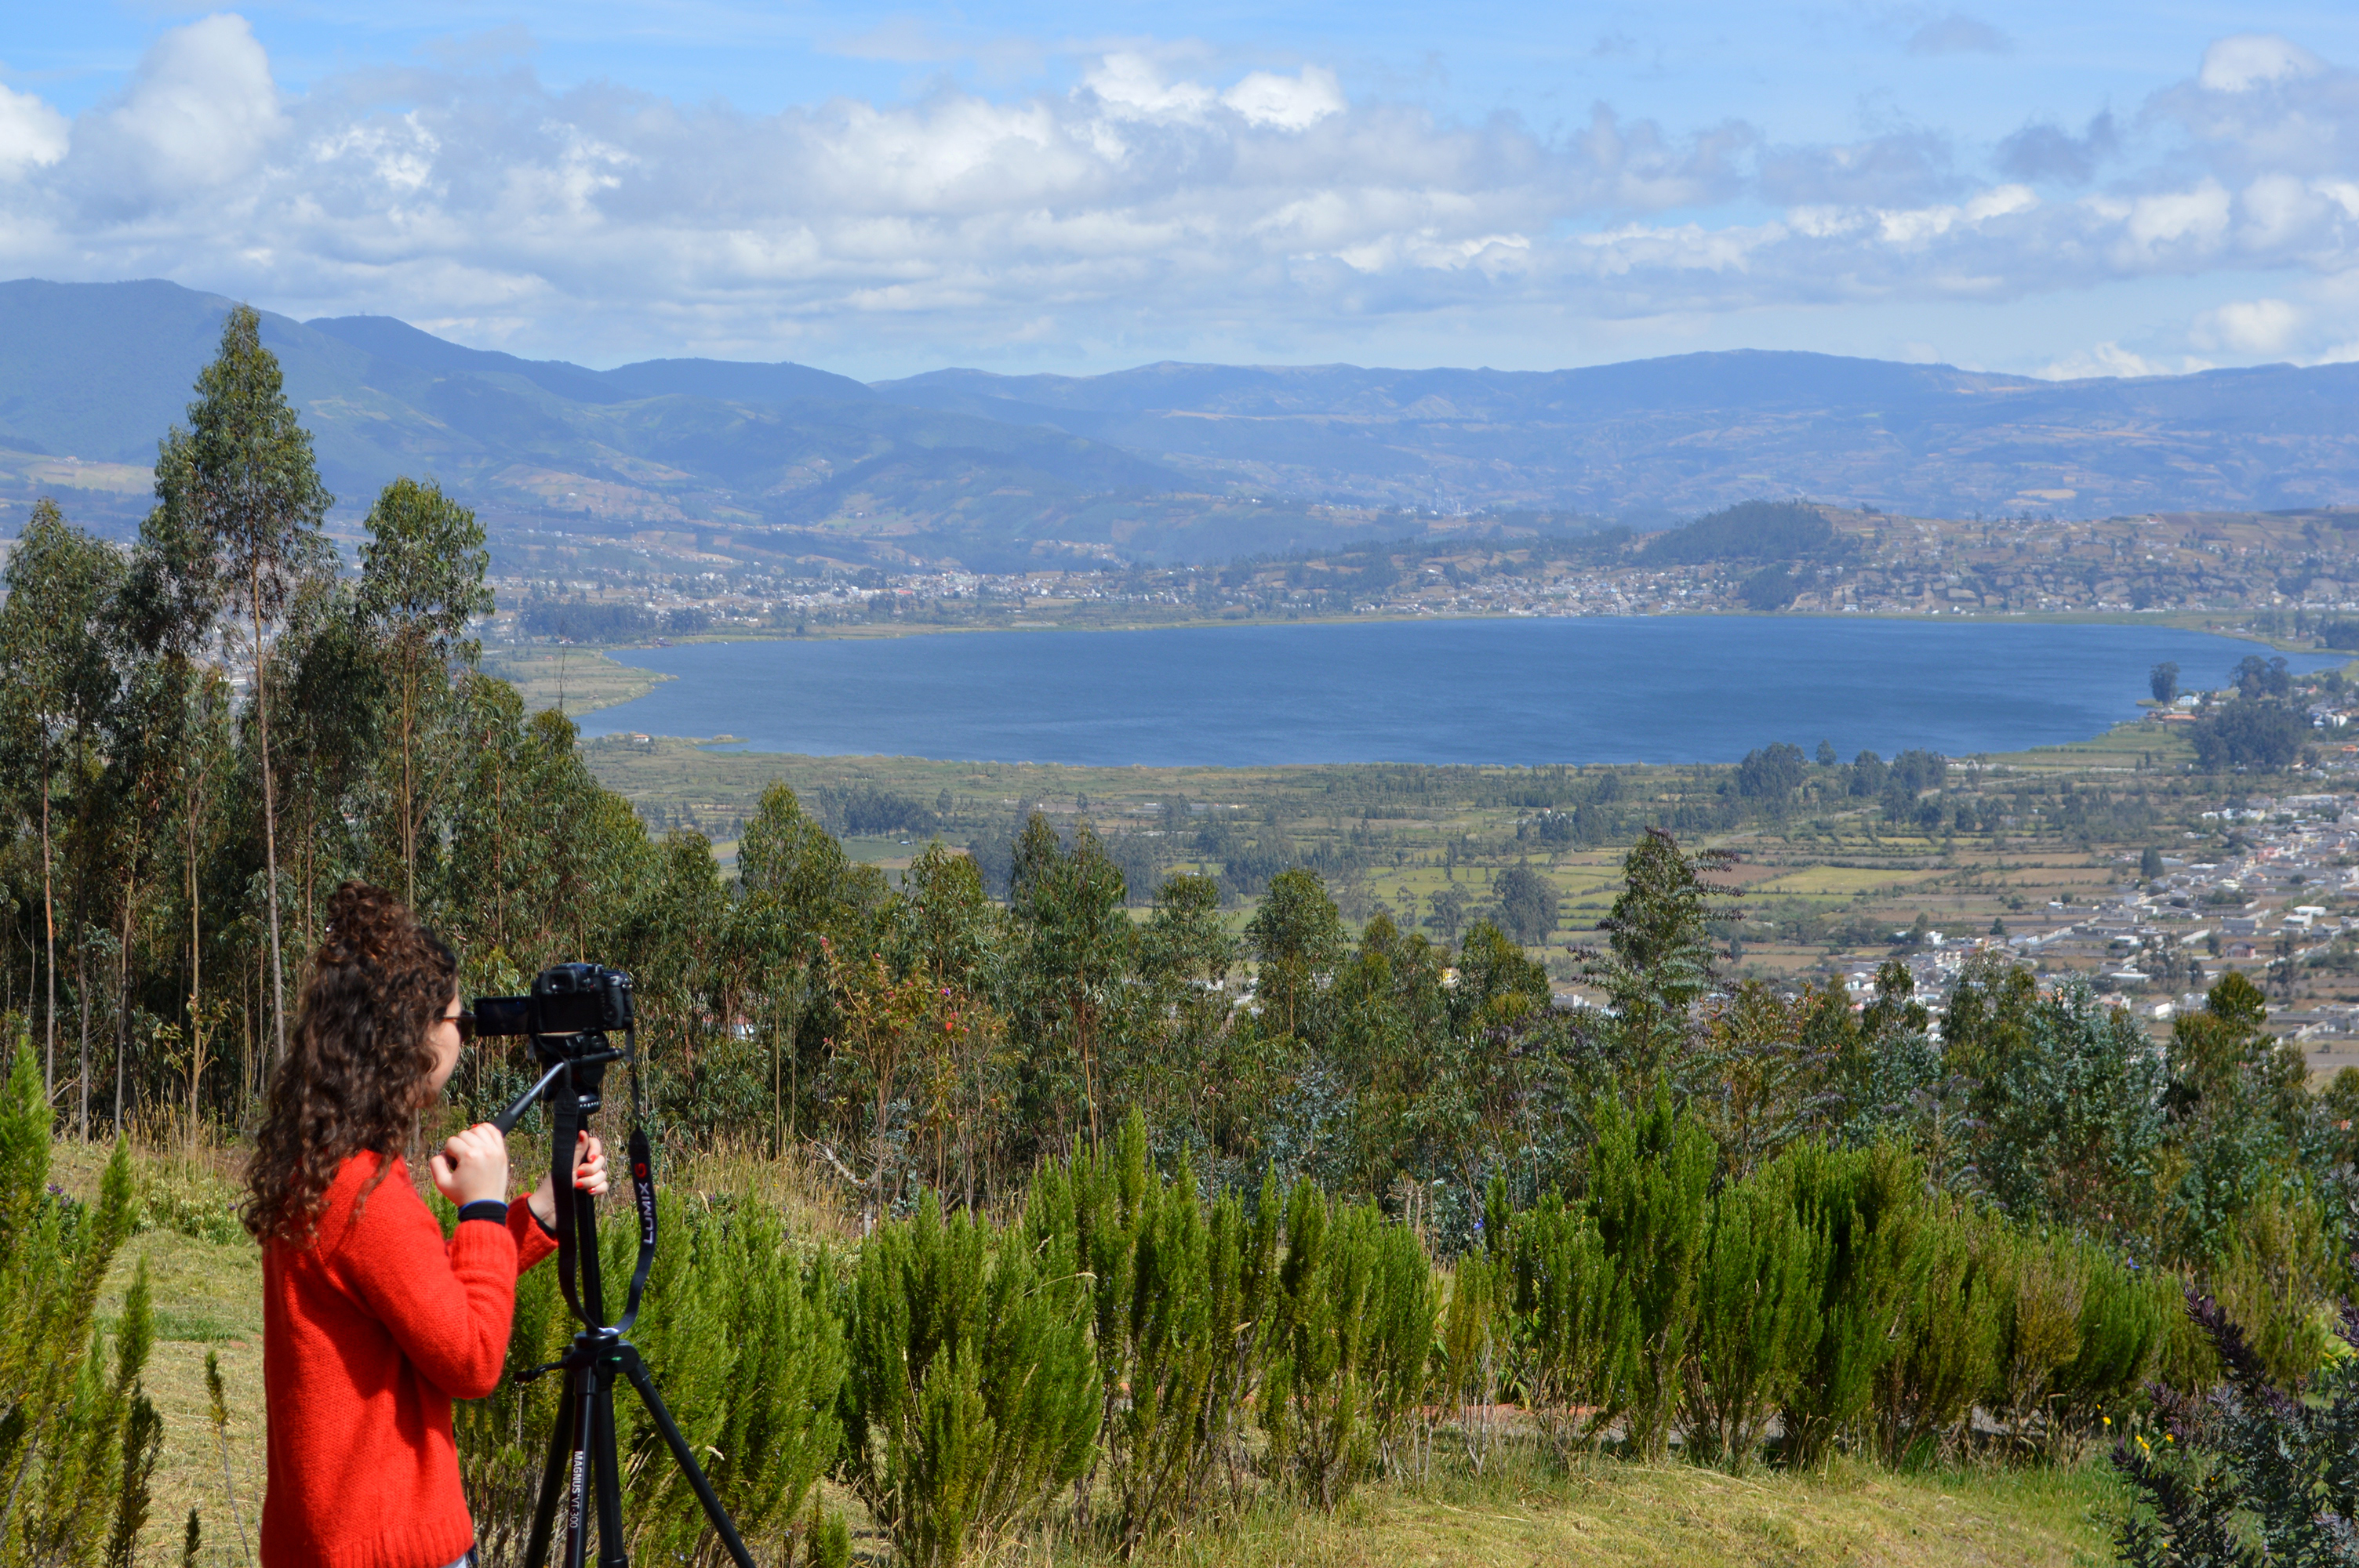 Paula Ortiz '18 shoots her film in Otavalo, Ecuador, overlooking Imbabura mountain.